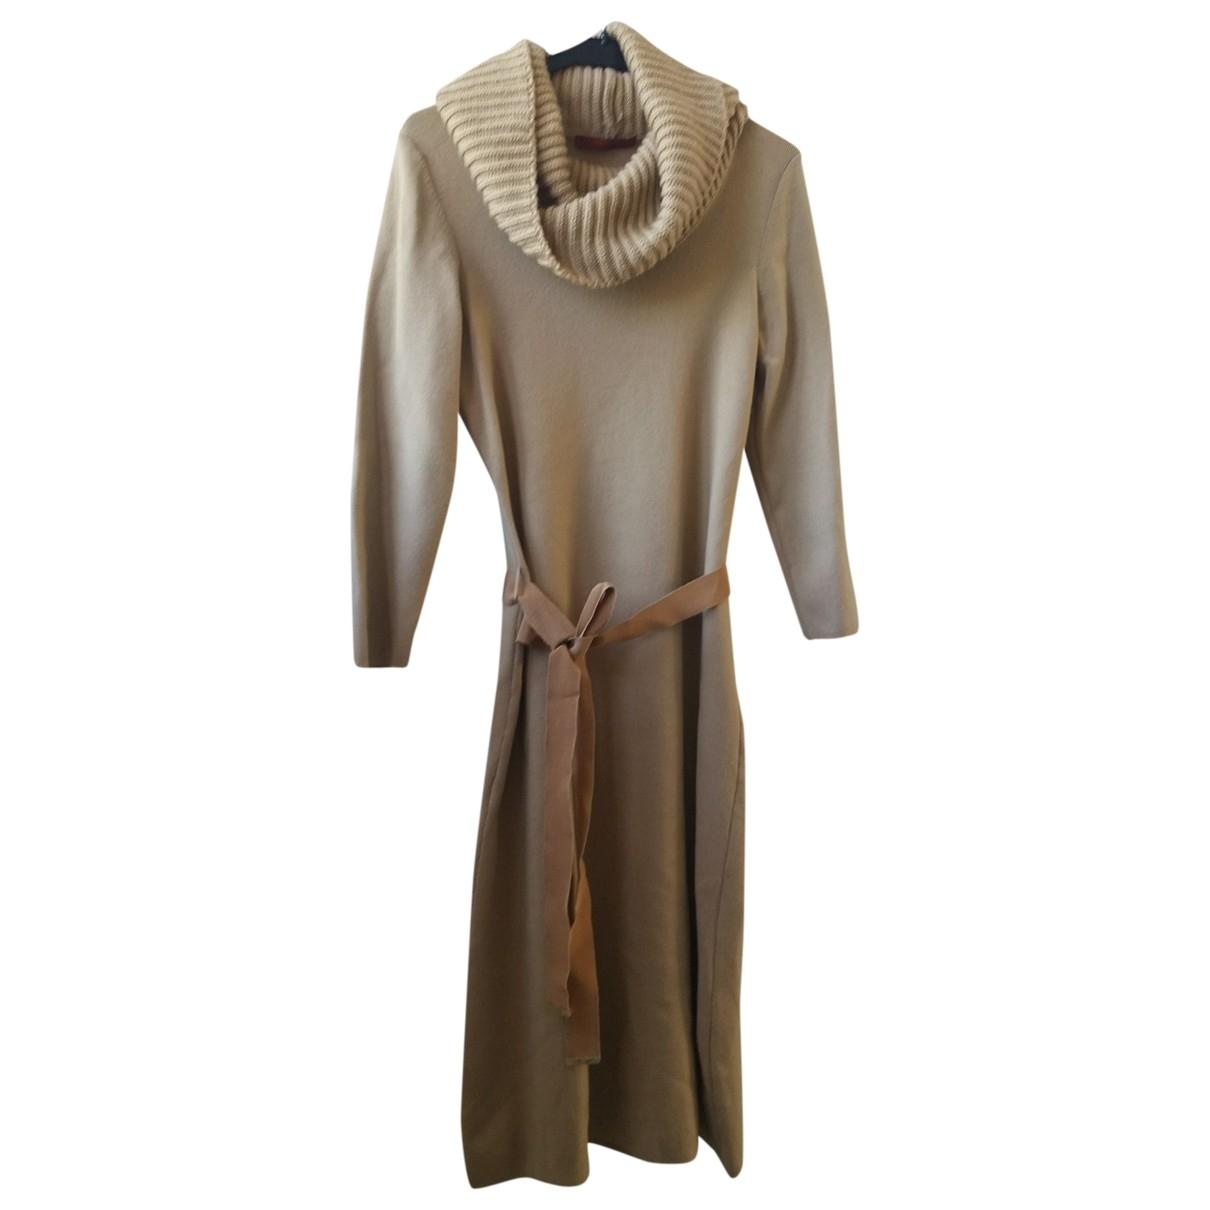 Carolina Herrera \N Camel Wool dress for Women S International